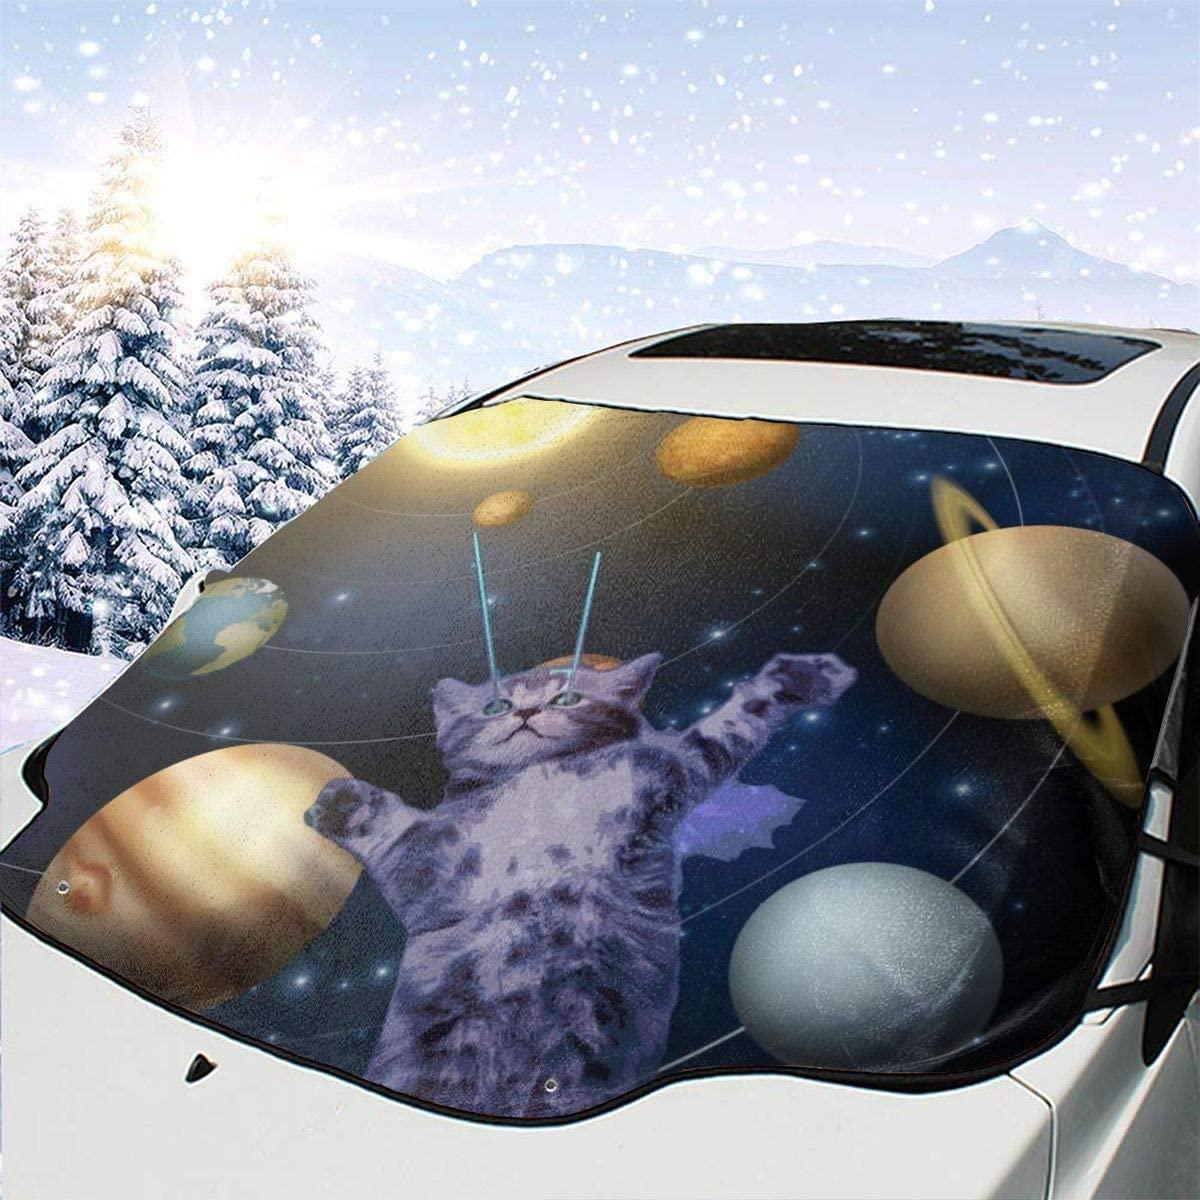 THONFIRE Car Front Window Windshield Winter Sunshade Universe Space Cat Cover Sand Proof Blocks Heat Damage Free Visor Protector Trucks Summer Heatshield